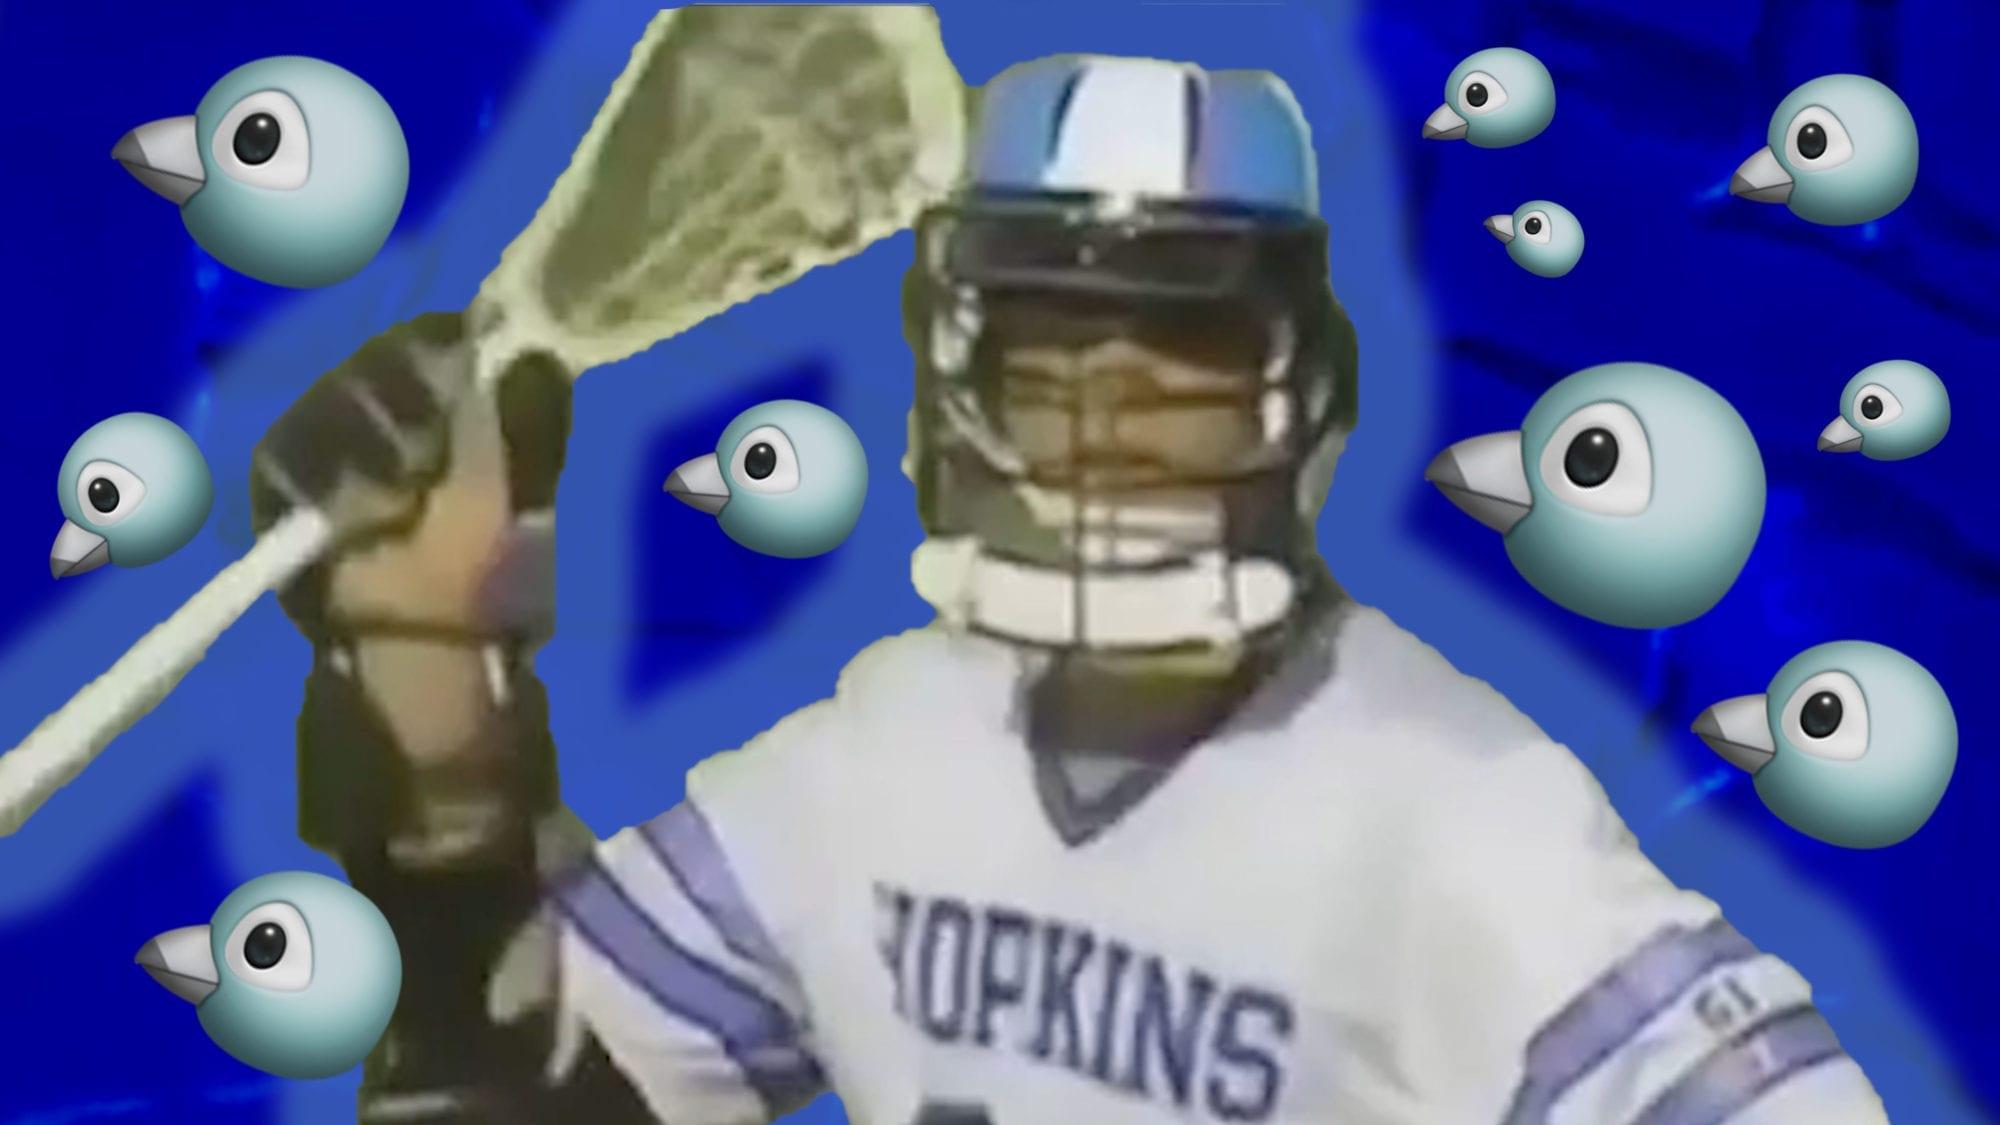 1989 Couldn't Handle Matt Panetta, Hopkins Great